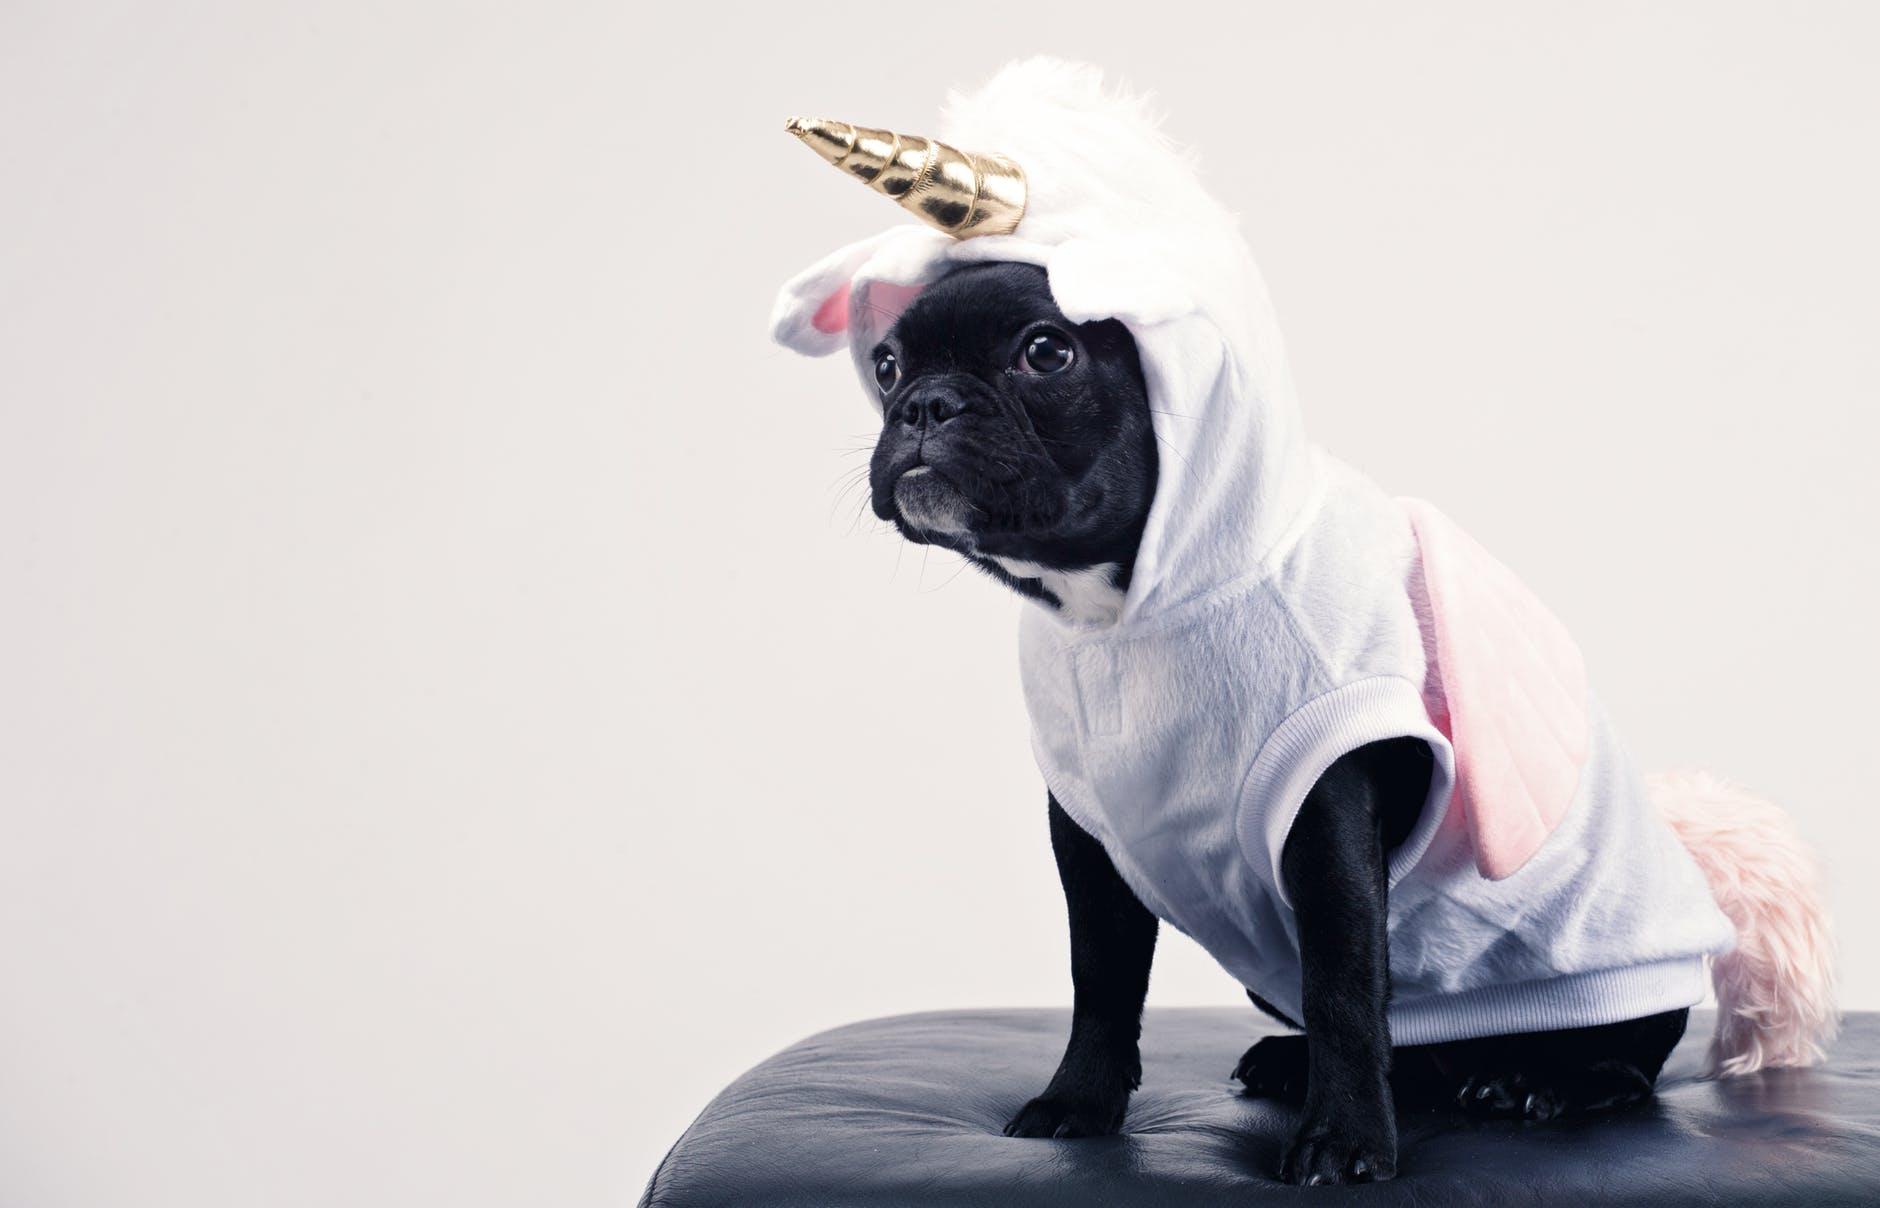 "Photo by mark glancy on <a href=""https://www.pexels.com/photo/boston-terrier-wearing-unicorn-pet-costume-1564506/"" rel=""nofollow"">Pexels.com</a>"